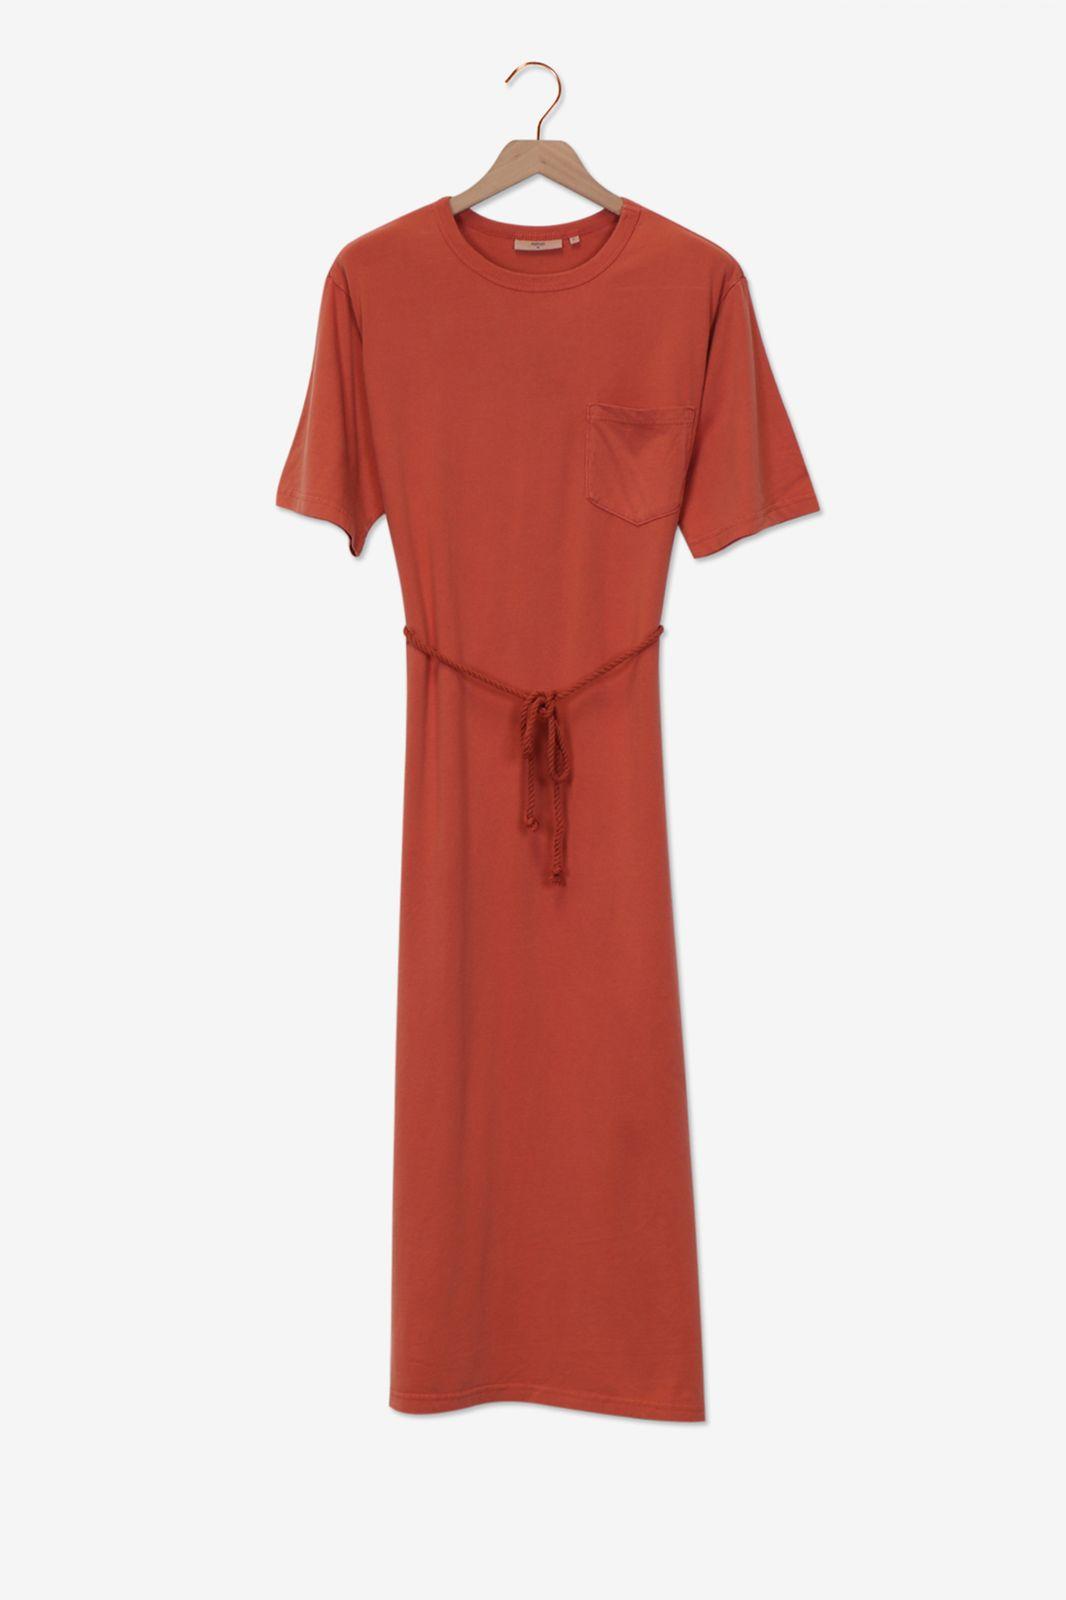 Minimum Rode jurk met taille koord - Dames | Sissy-Boy